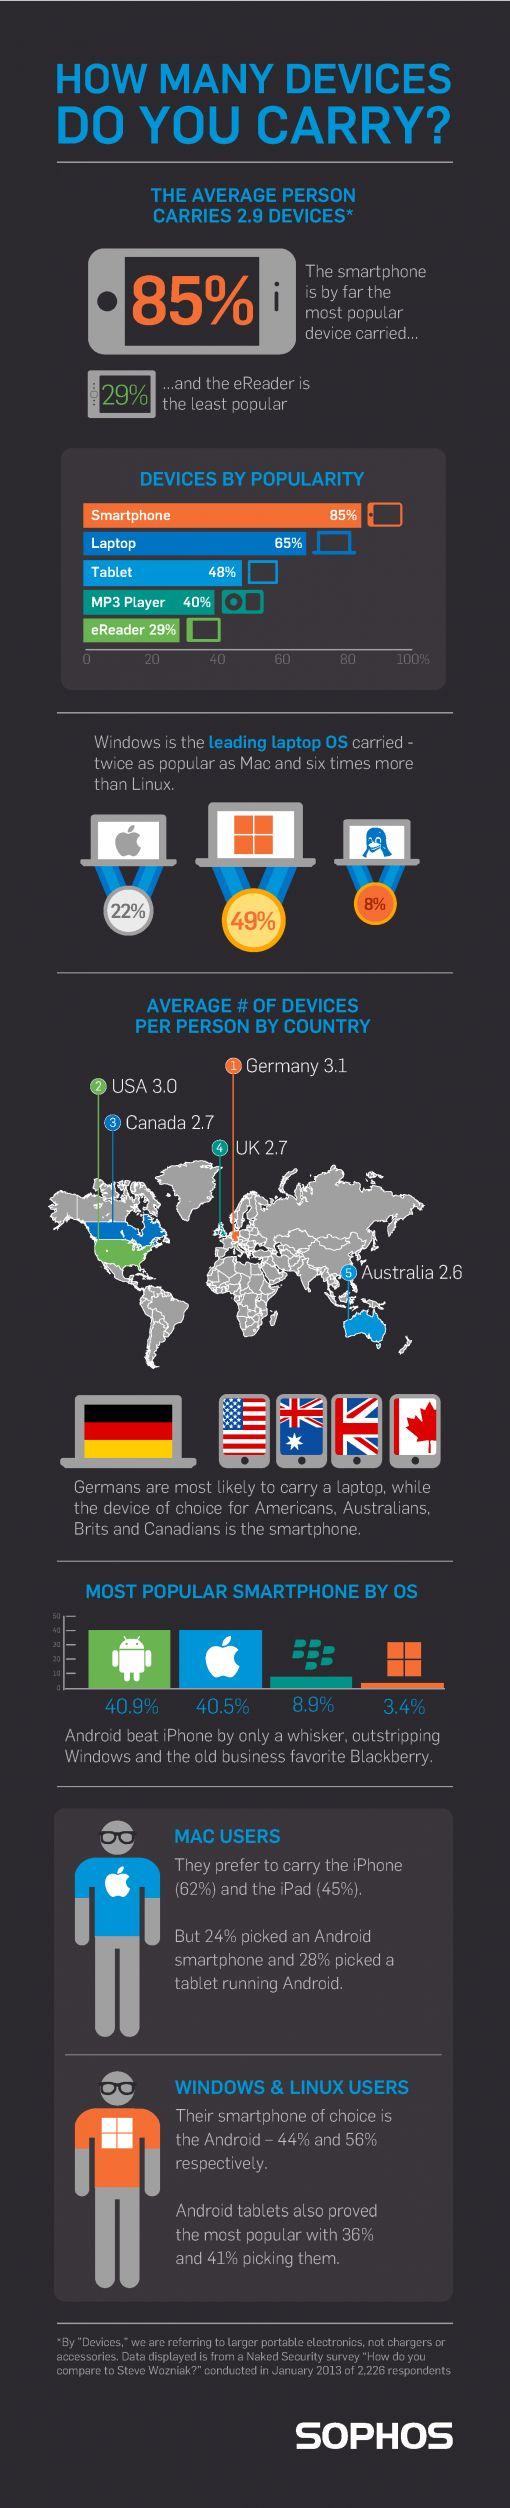 device-infographic